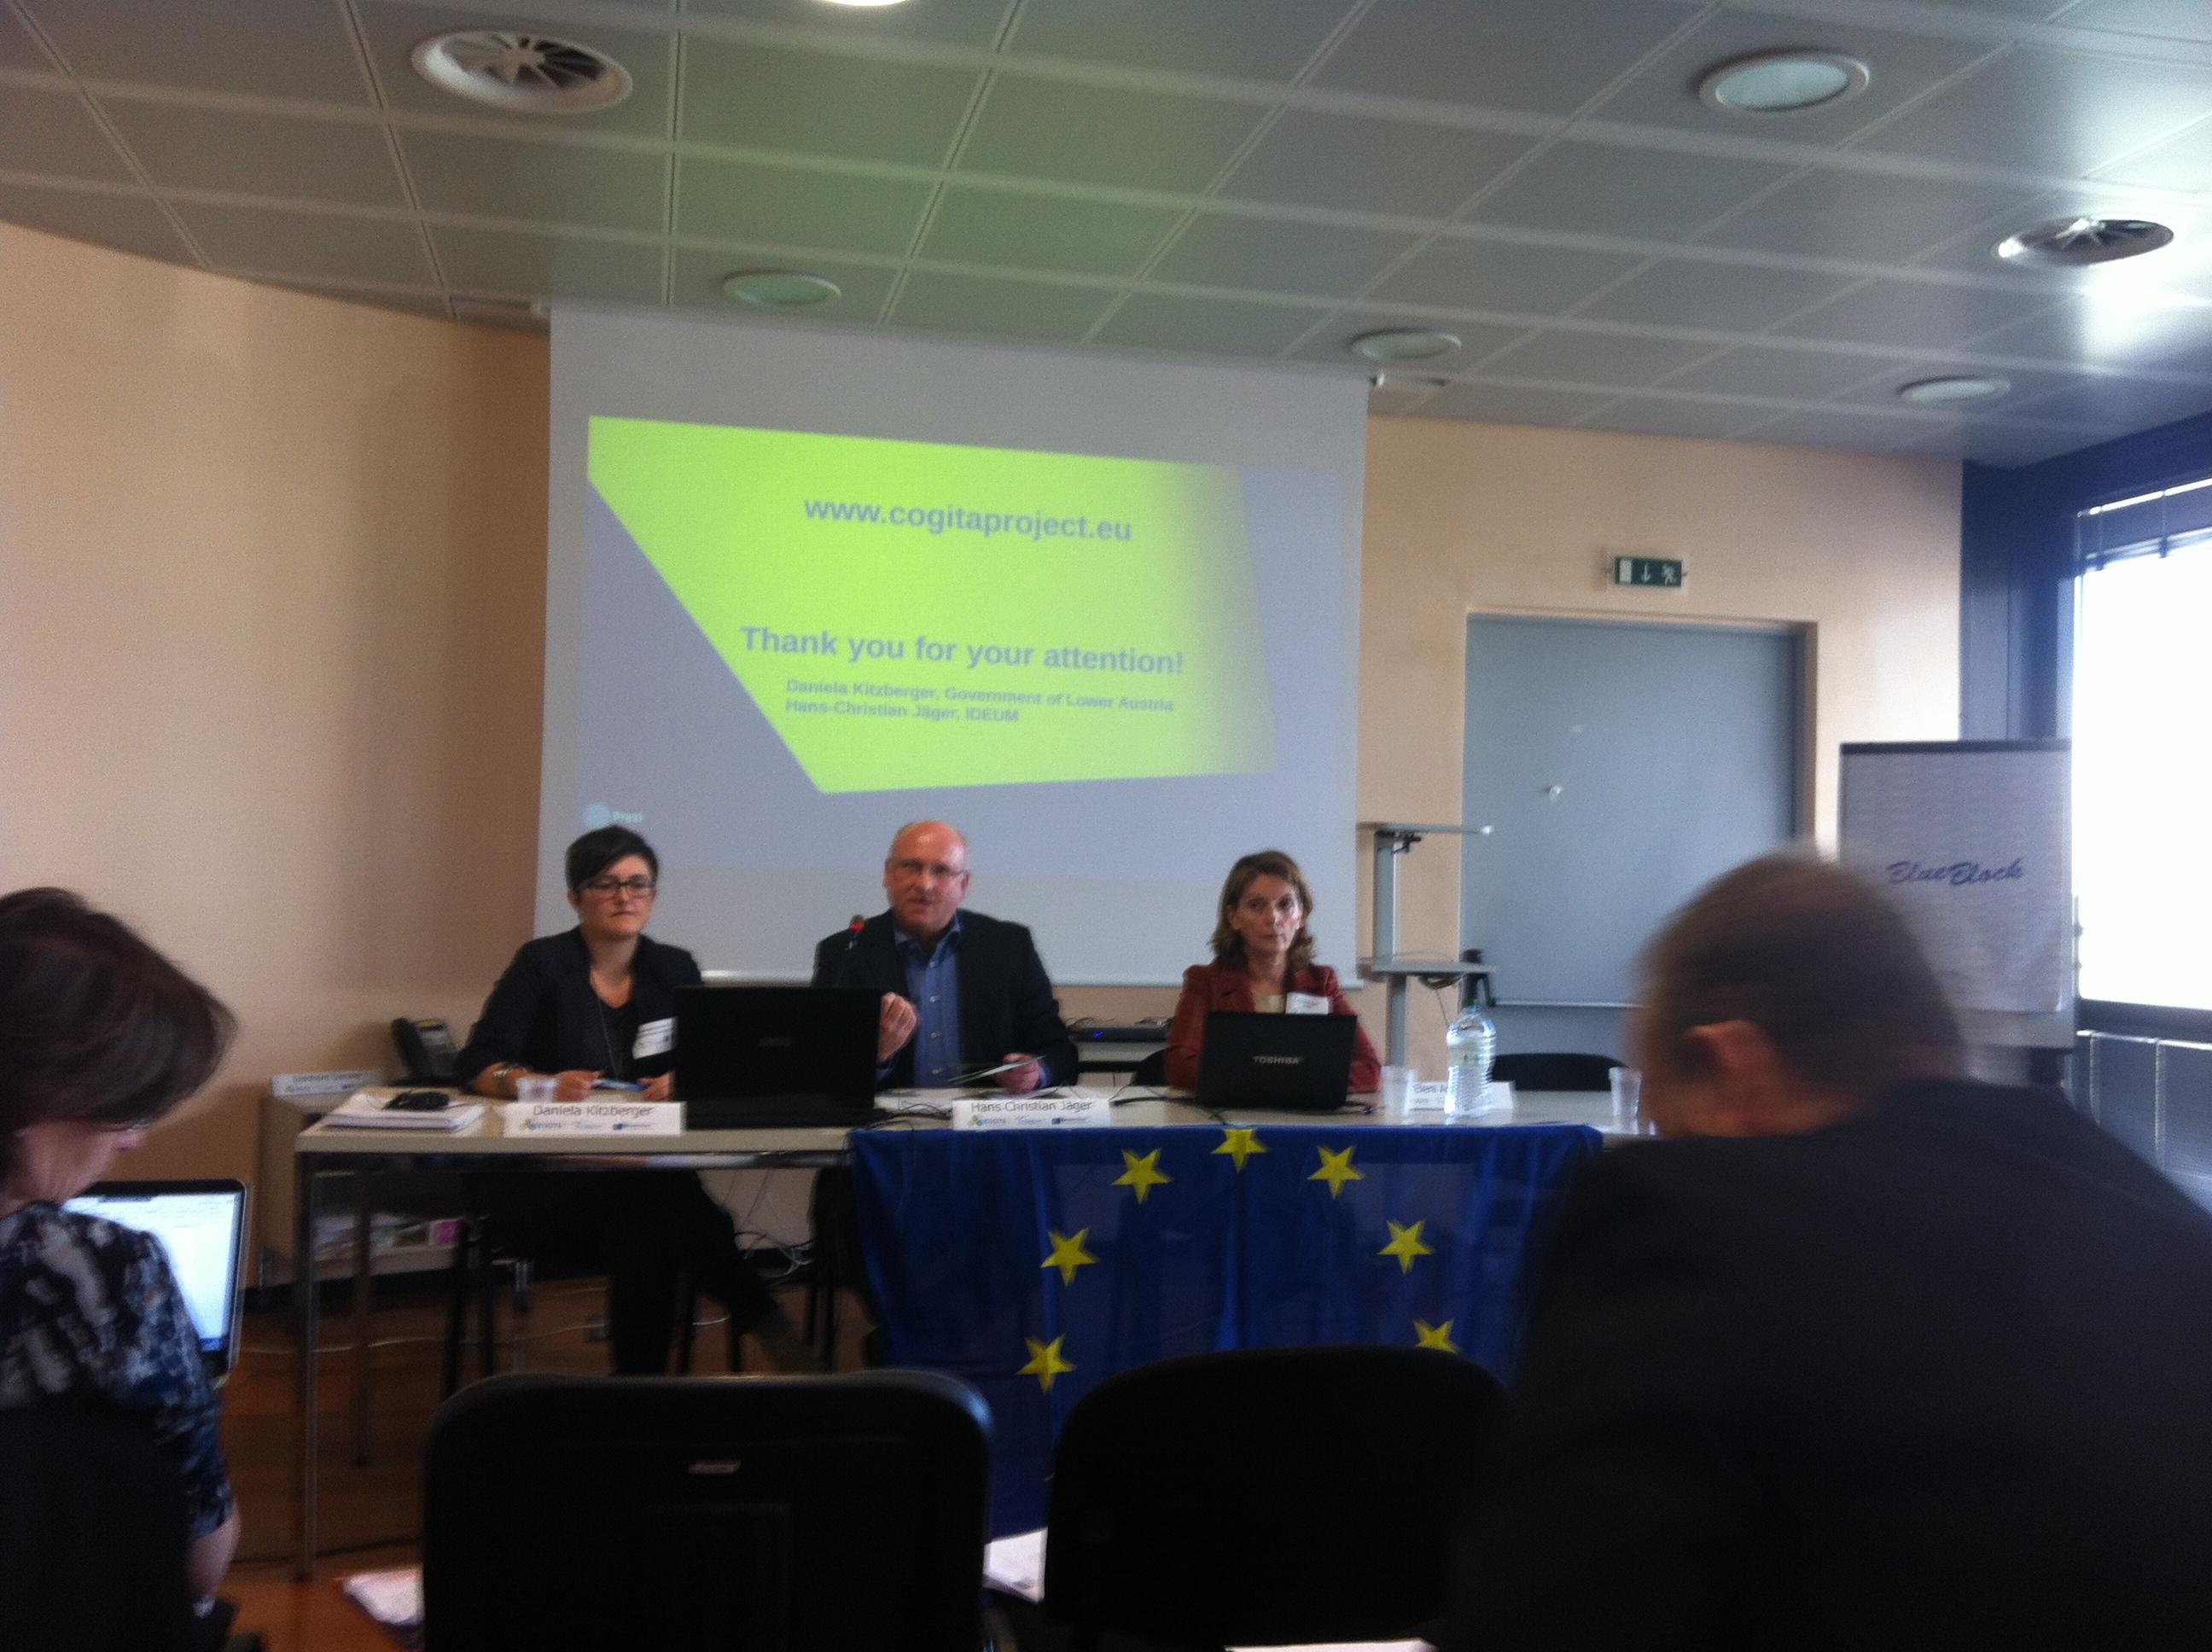 Daniela Kitzberger i Hans-Christian Jaeger, Govern Baixa Àustria; Eleni Apospori, Universitat d'Economia i Negocis d'Atenes